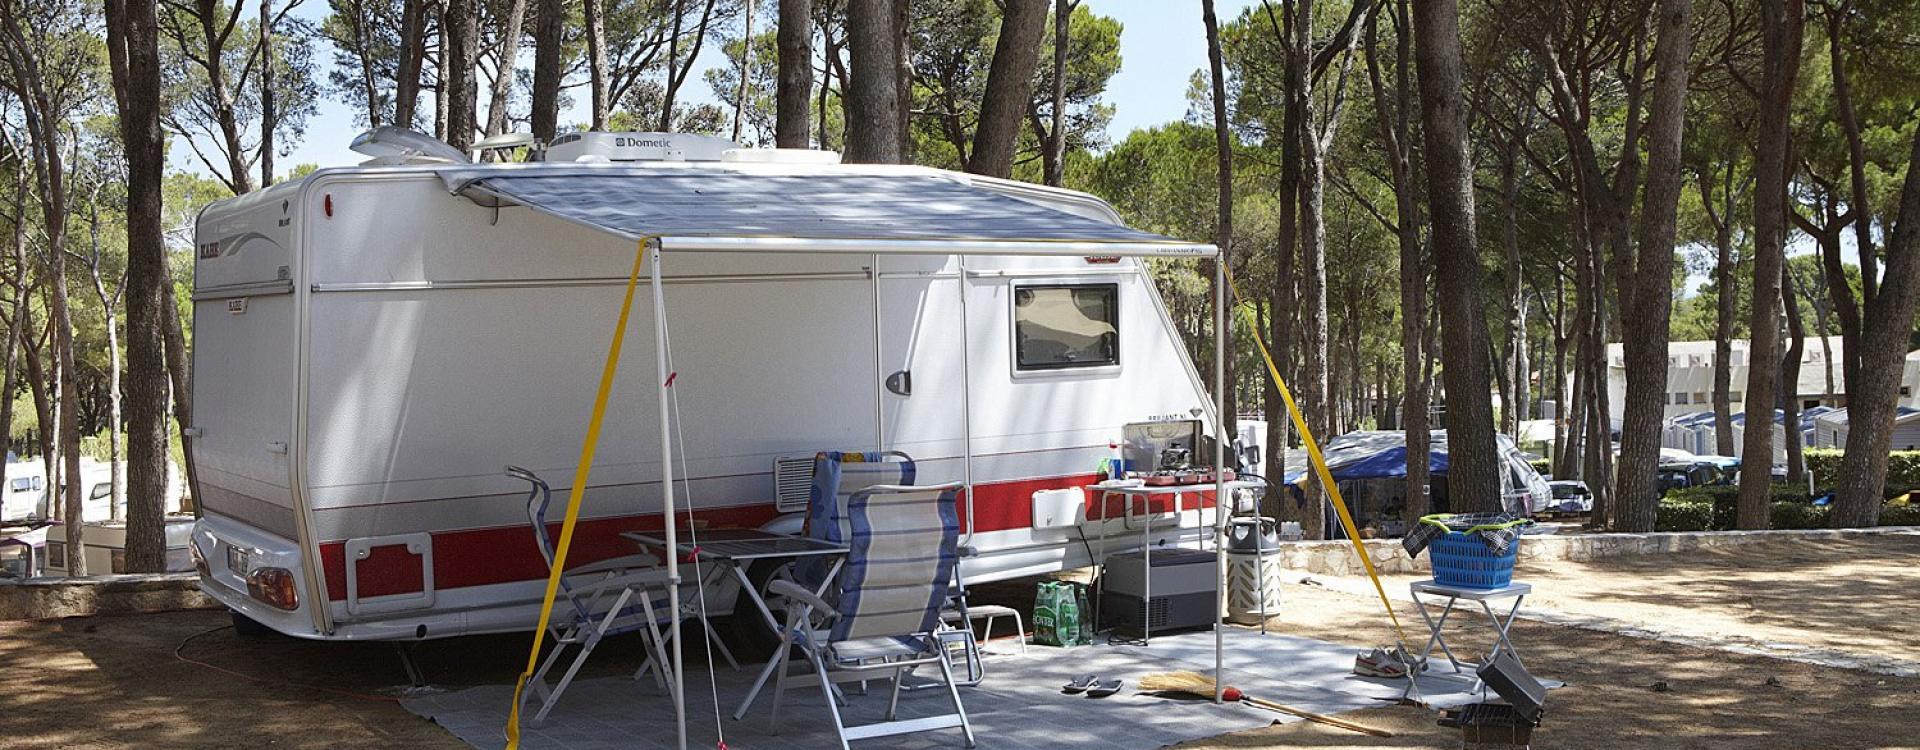 Caravan plot in a campsite in Pals - Costa Brava